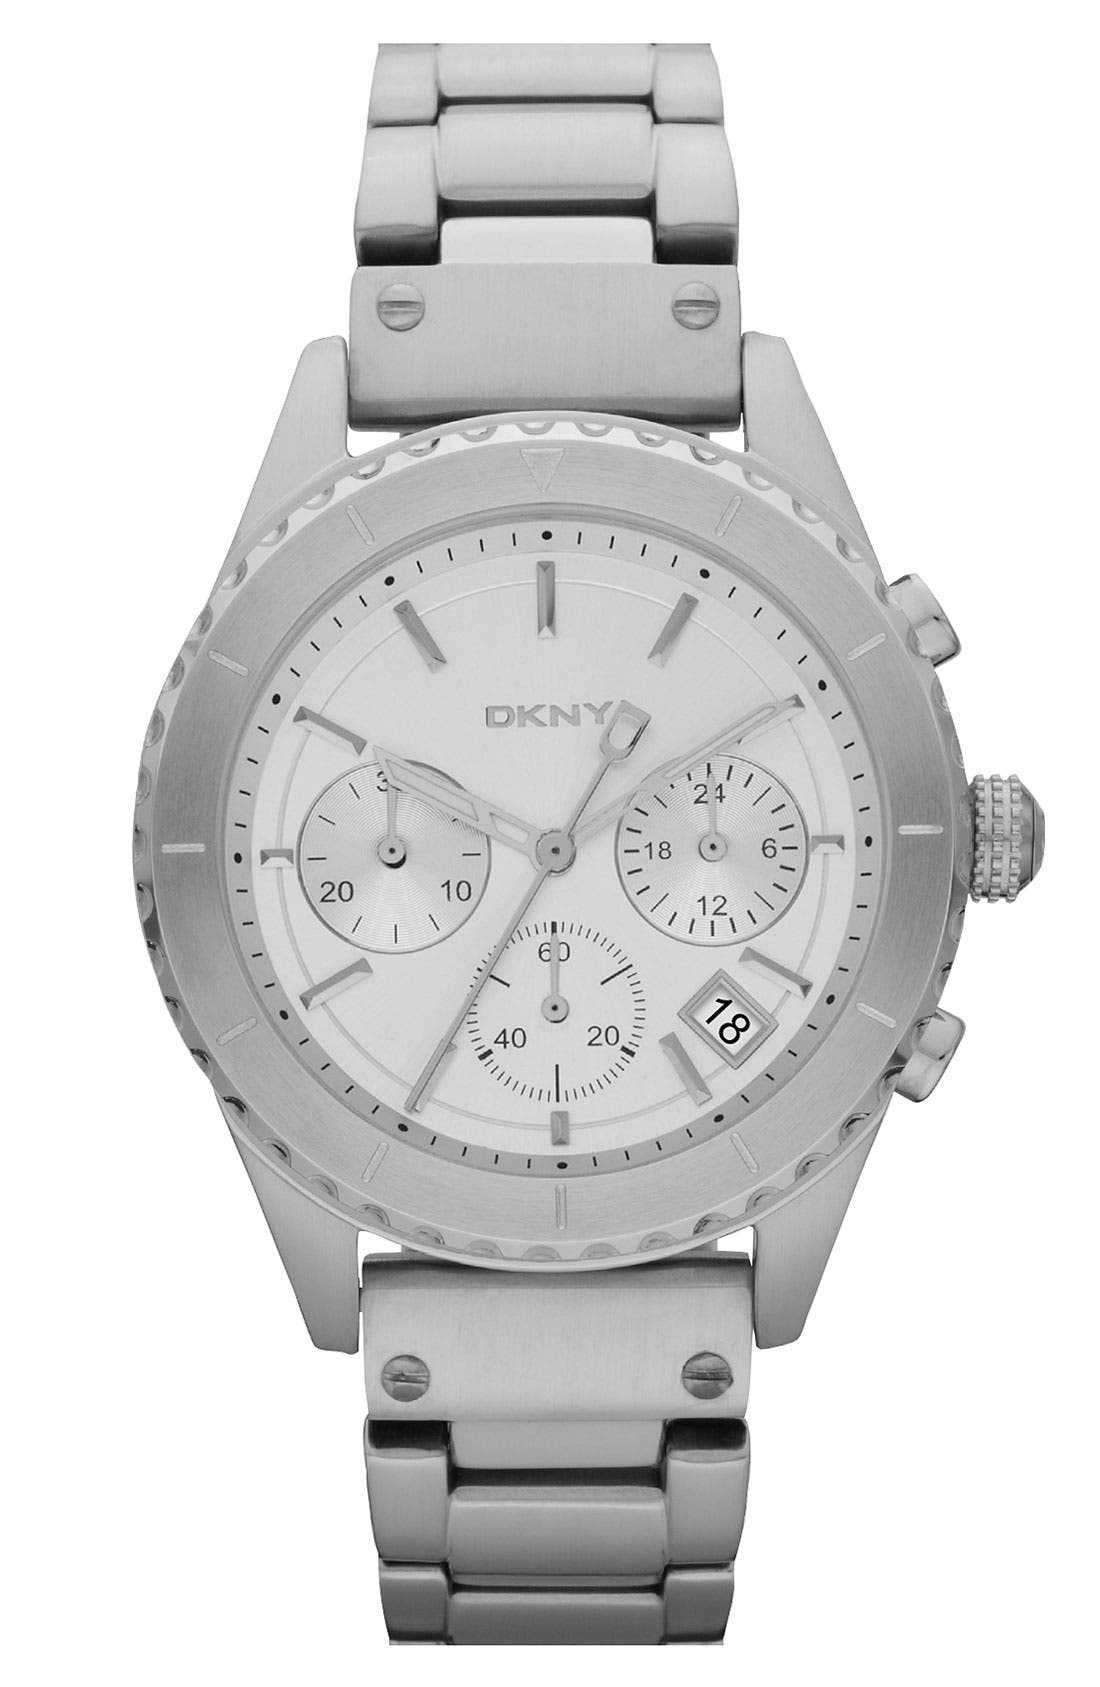 Main Image - DKNY 'Street Smart' Chronograph Notched Bezel Watch